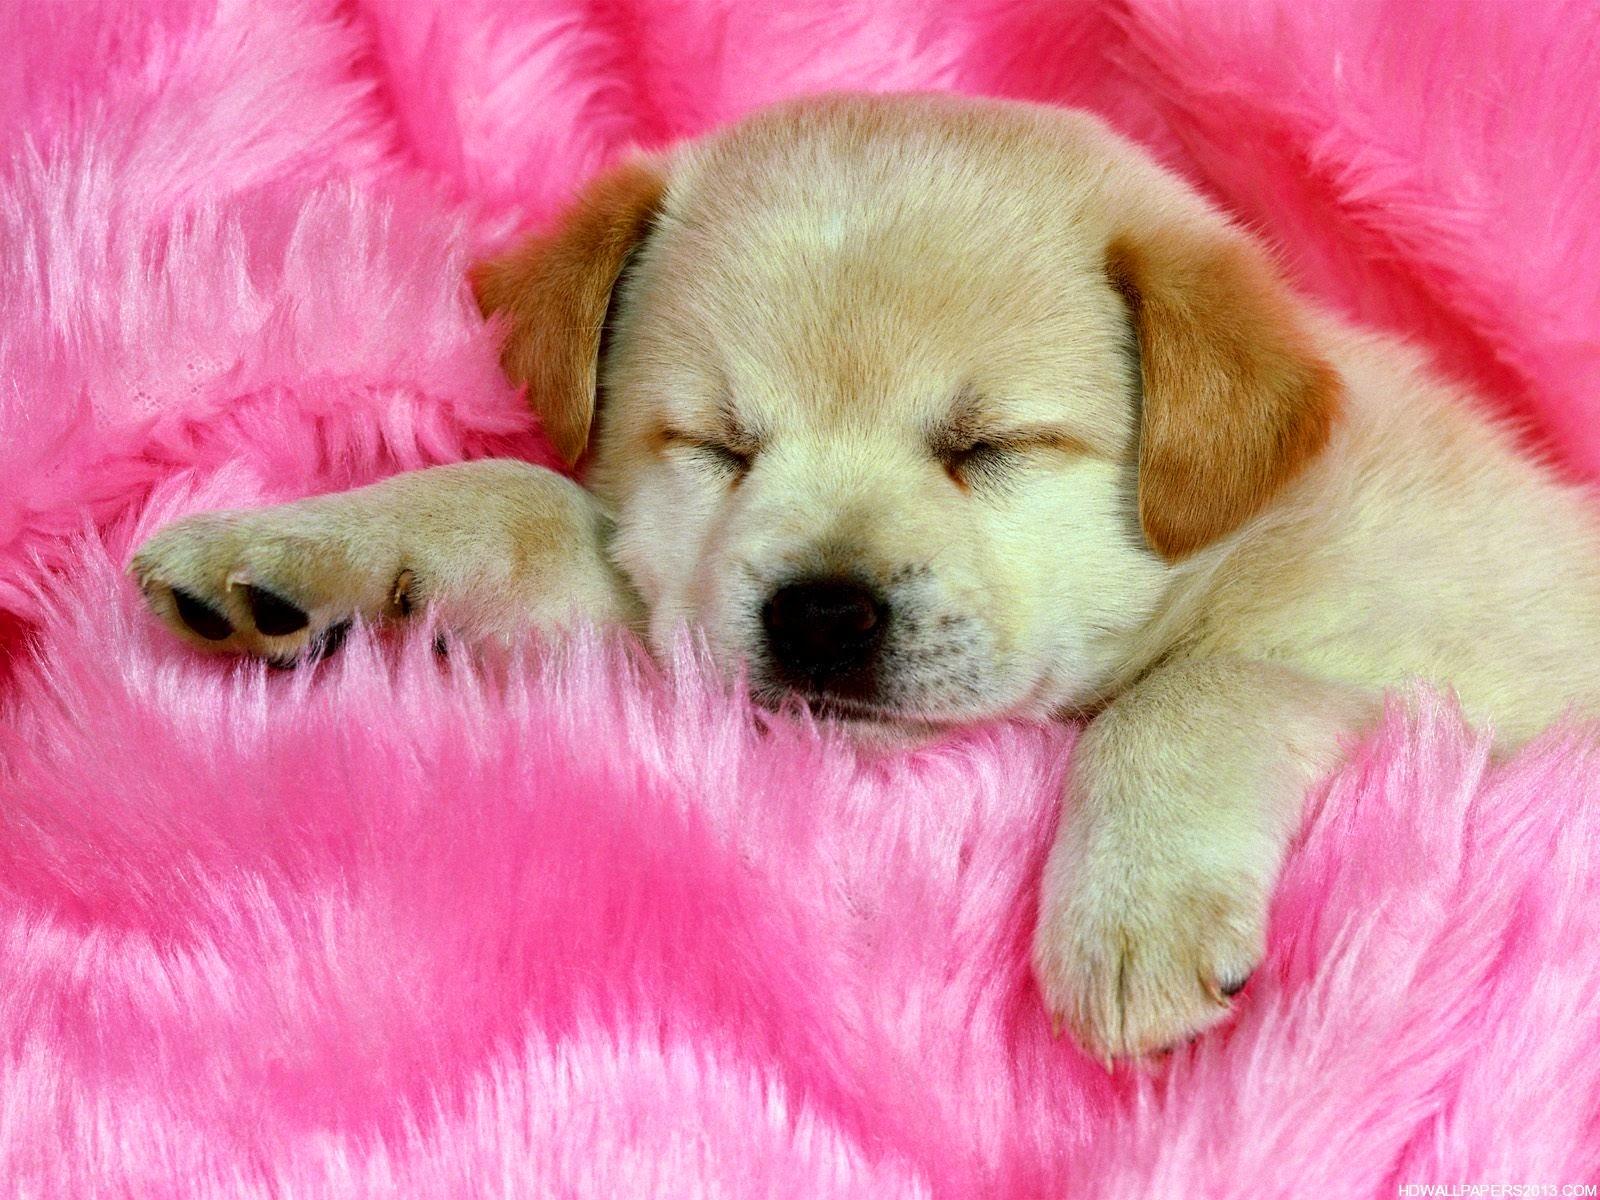 Brown sleeping Dog